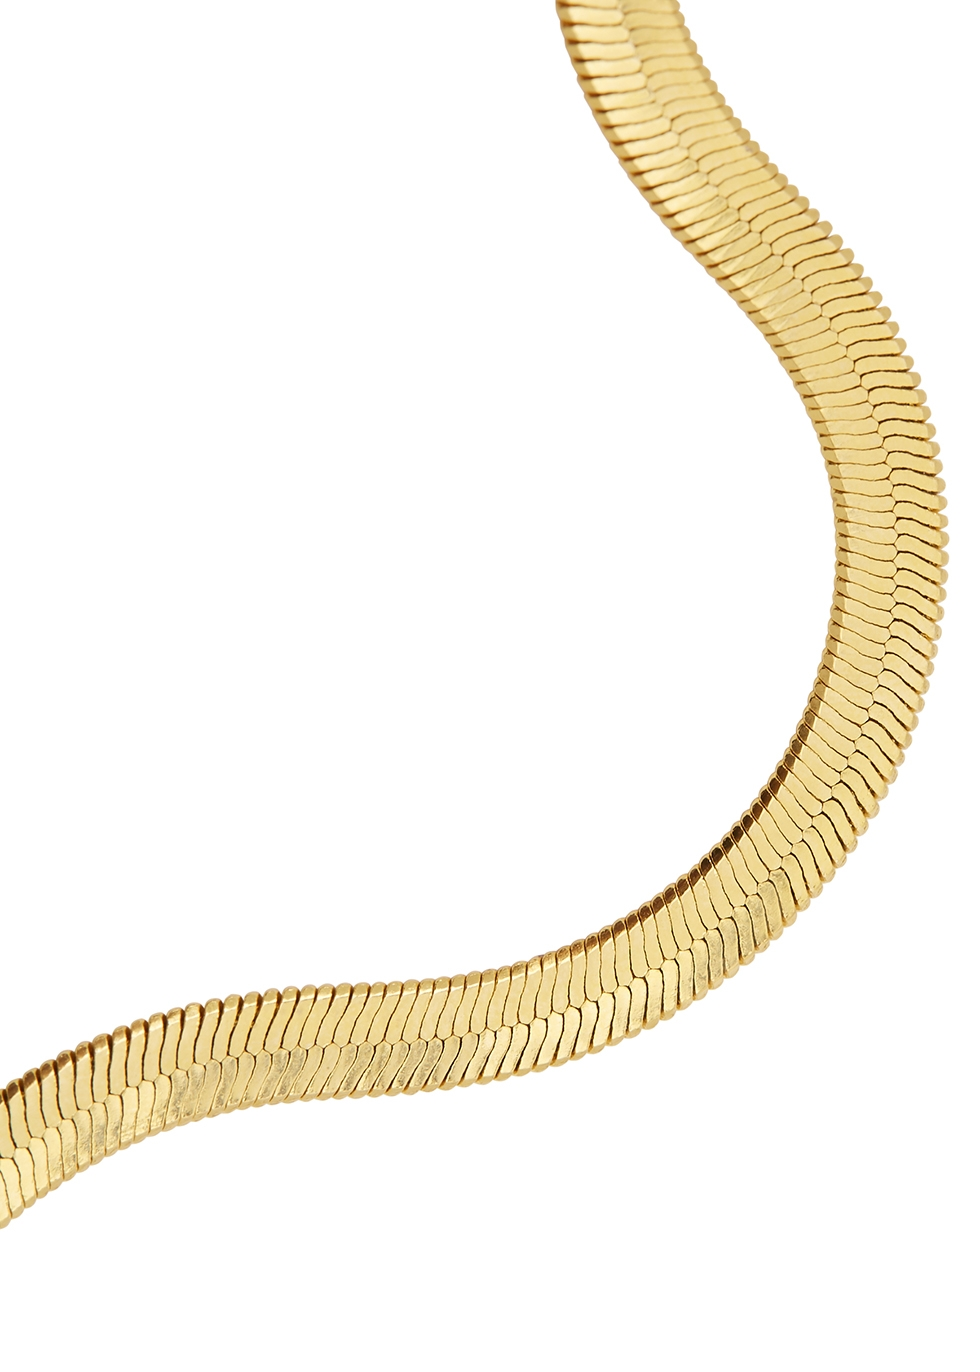 Liquid gold-plated chain necklace - FALLON